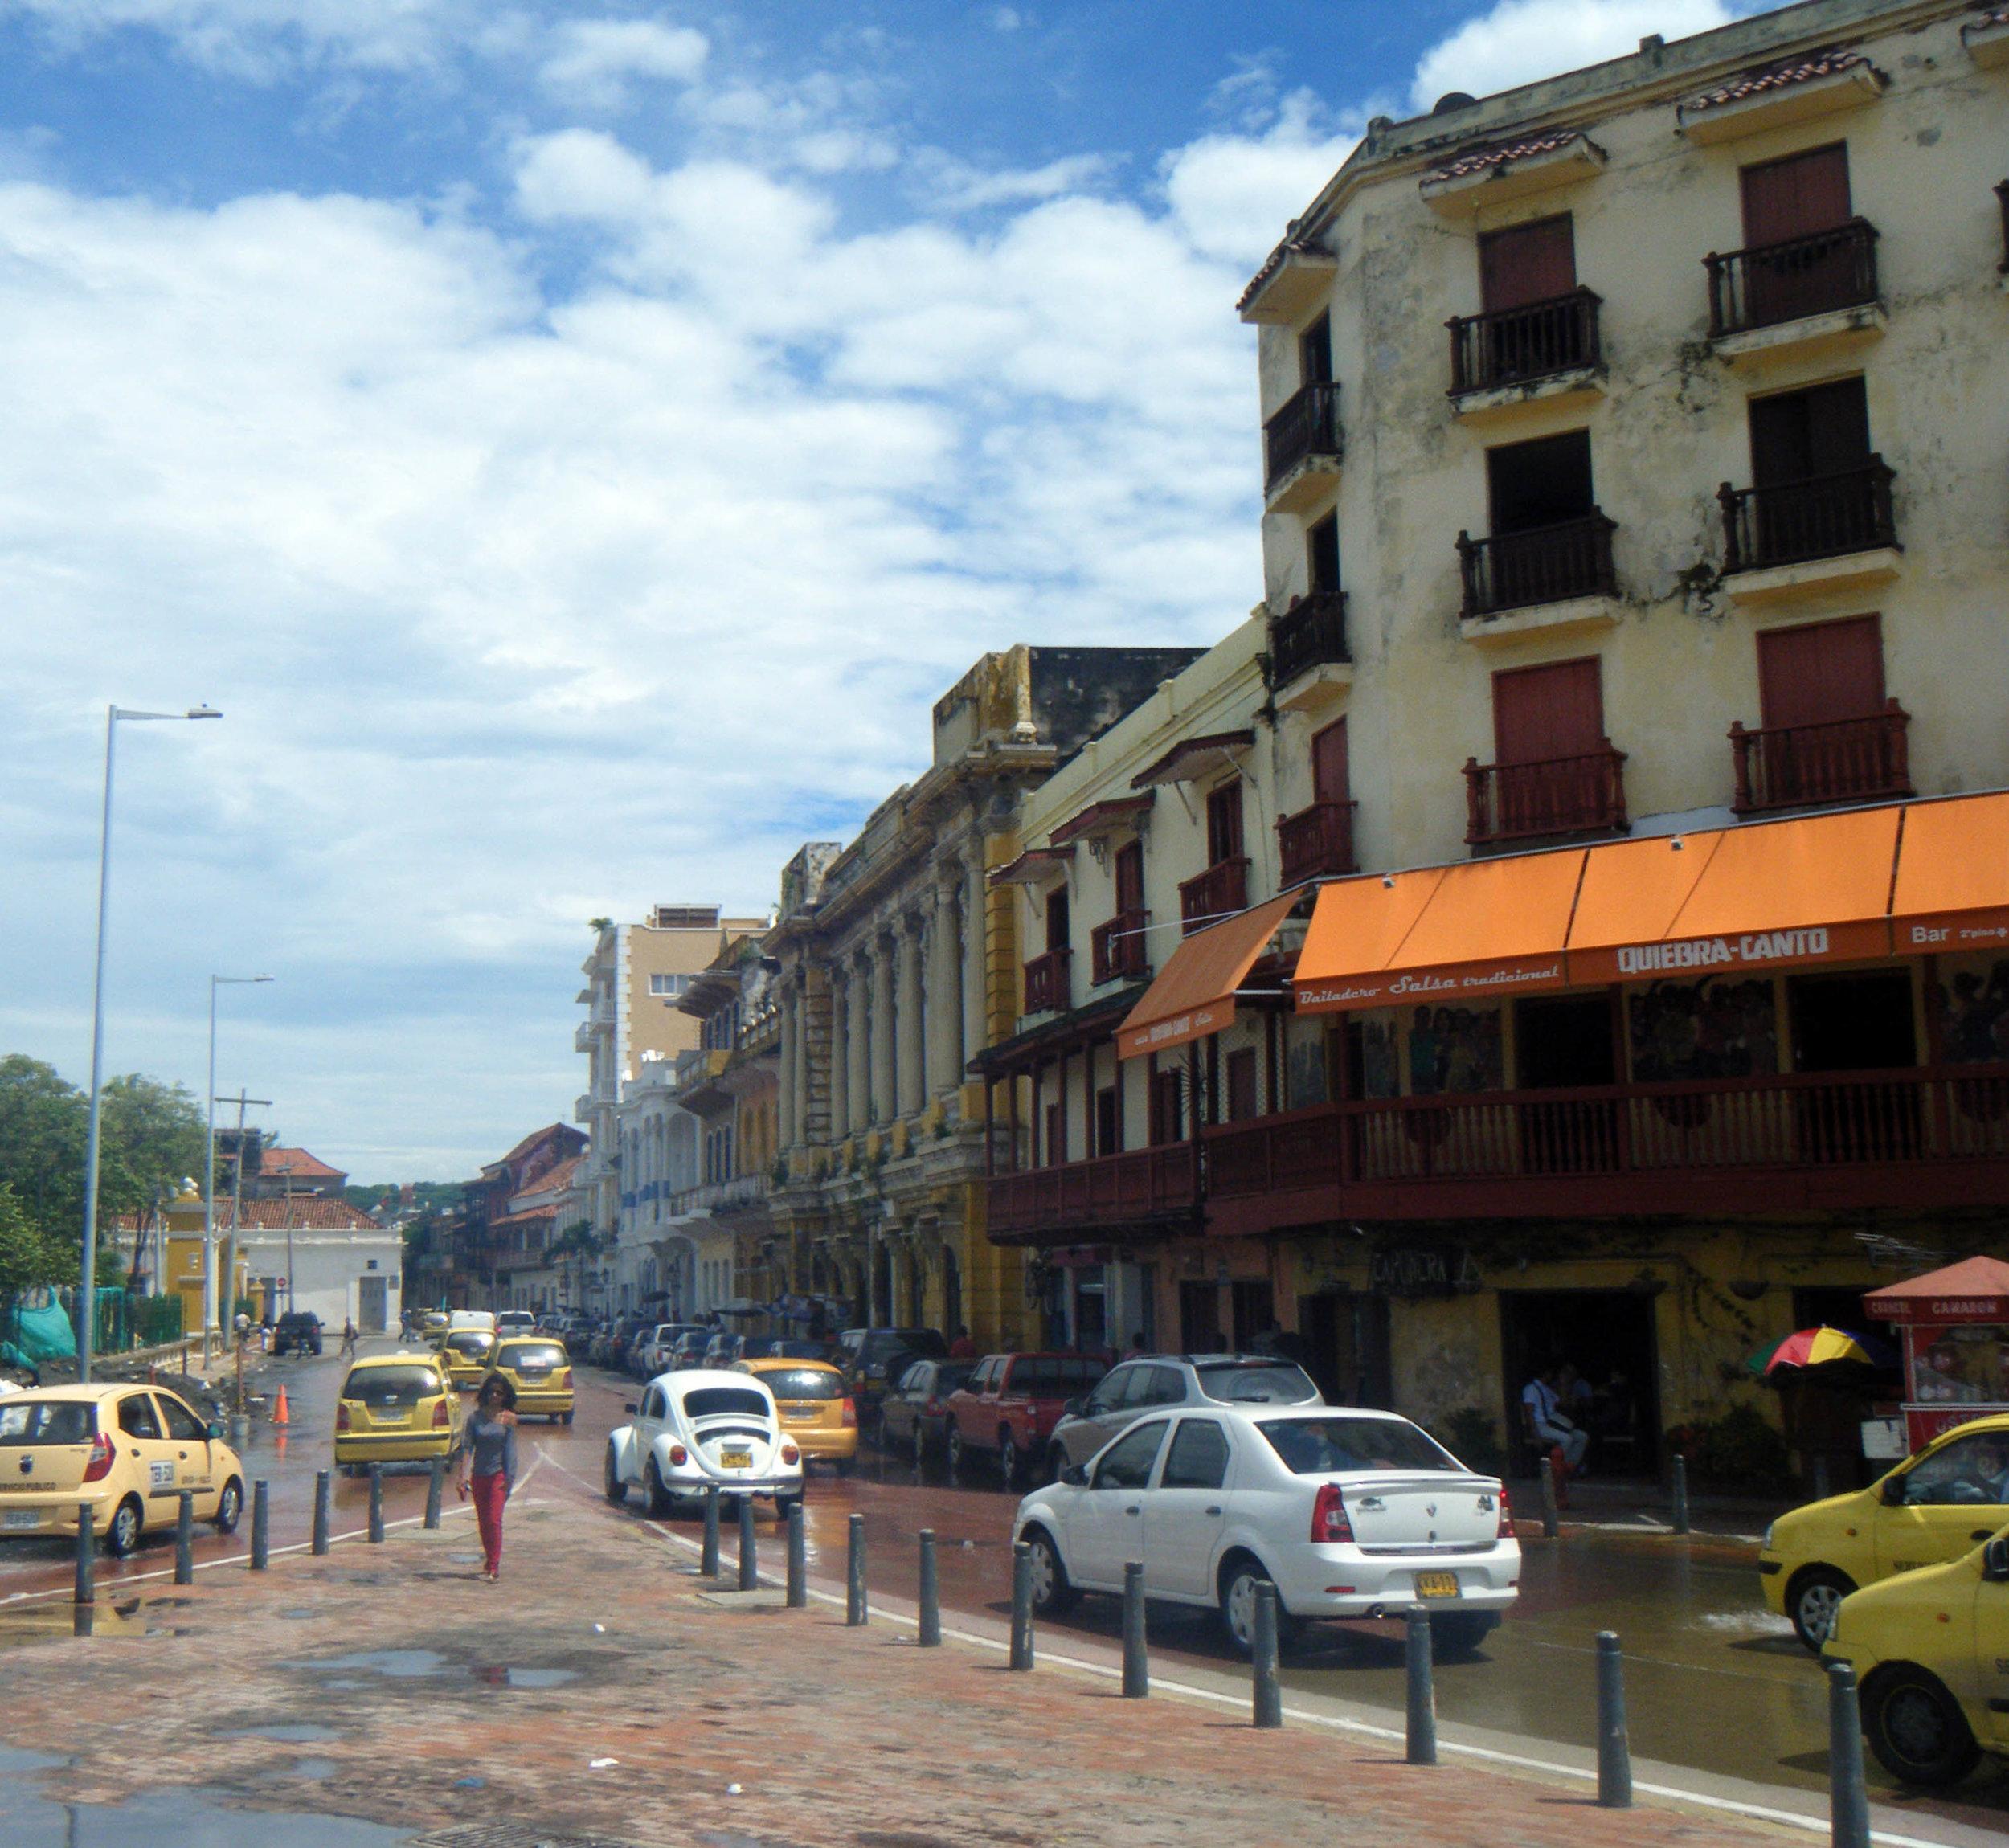 Getsemani, Cartagena.jpg